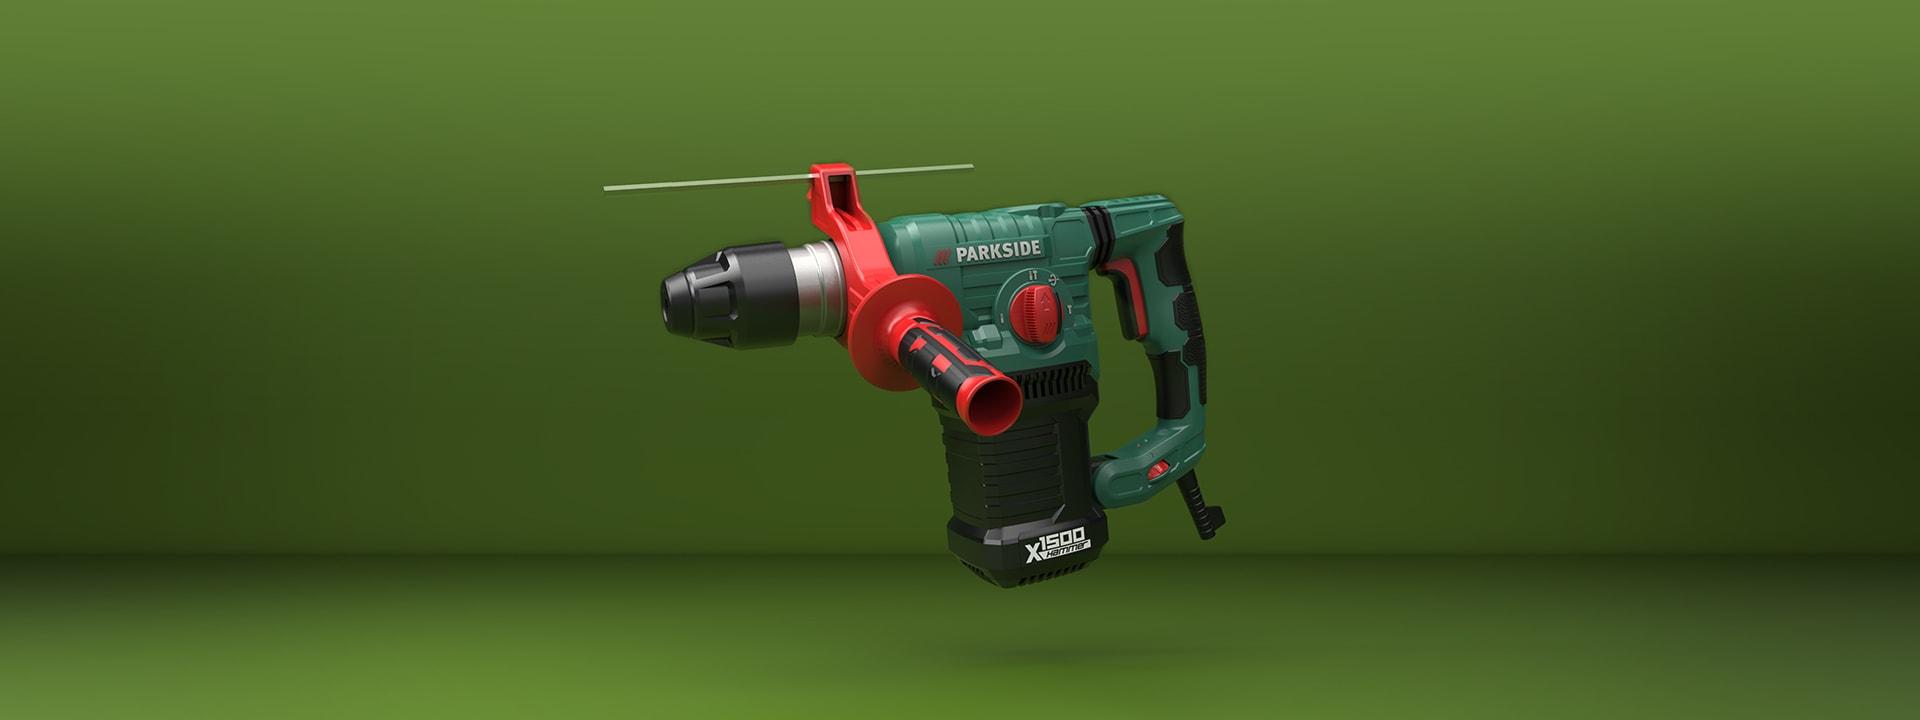 parkside_hammer_heavy_duty_industrialdesign_projekter